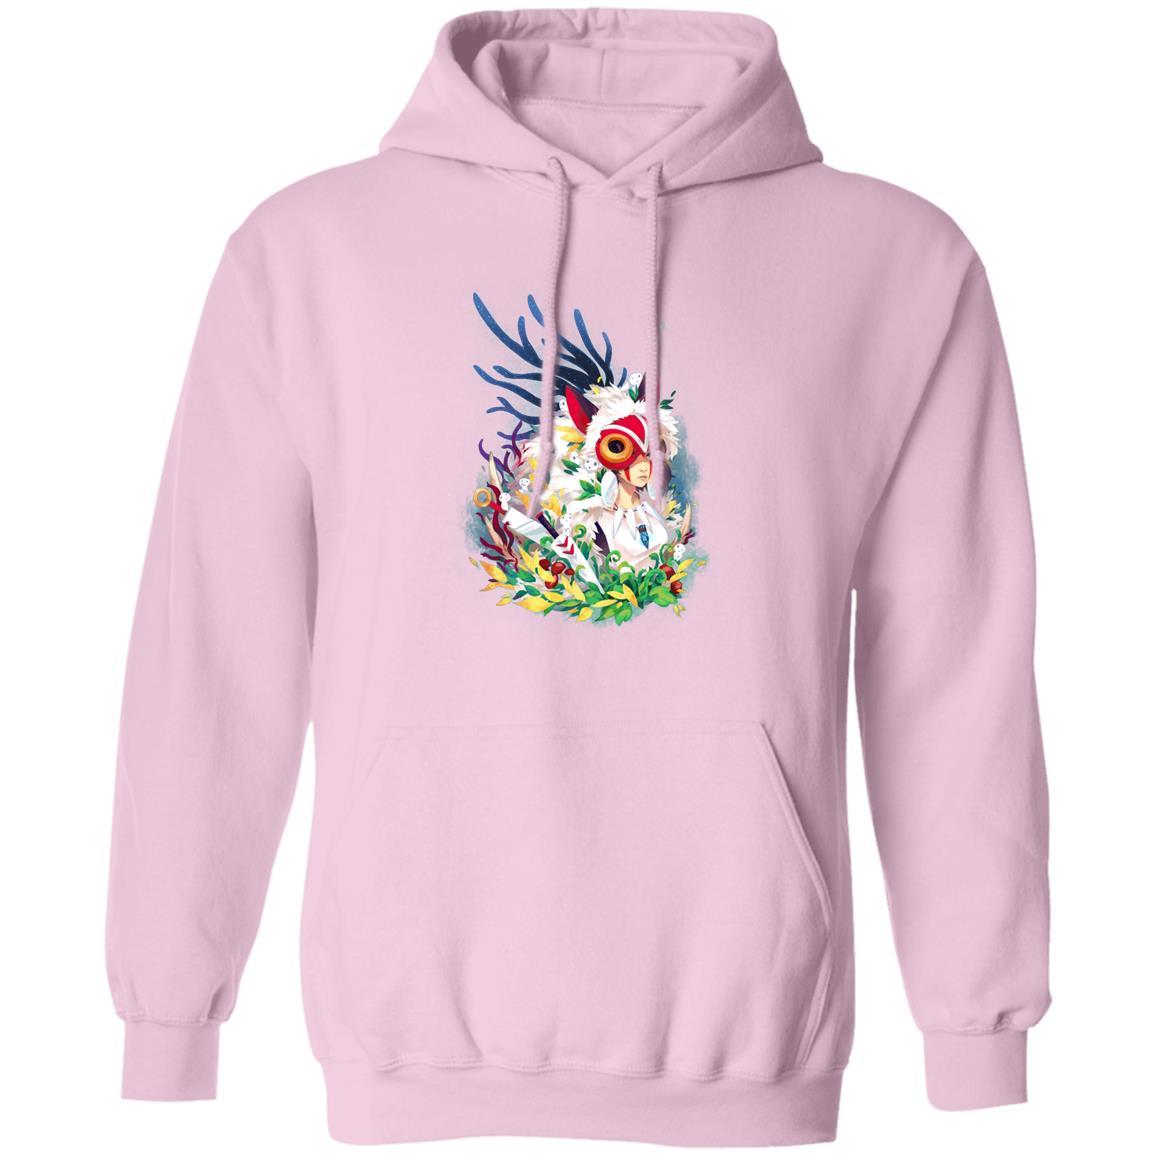 Princess Mononoke Colorful Portrait Hoodie